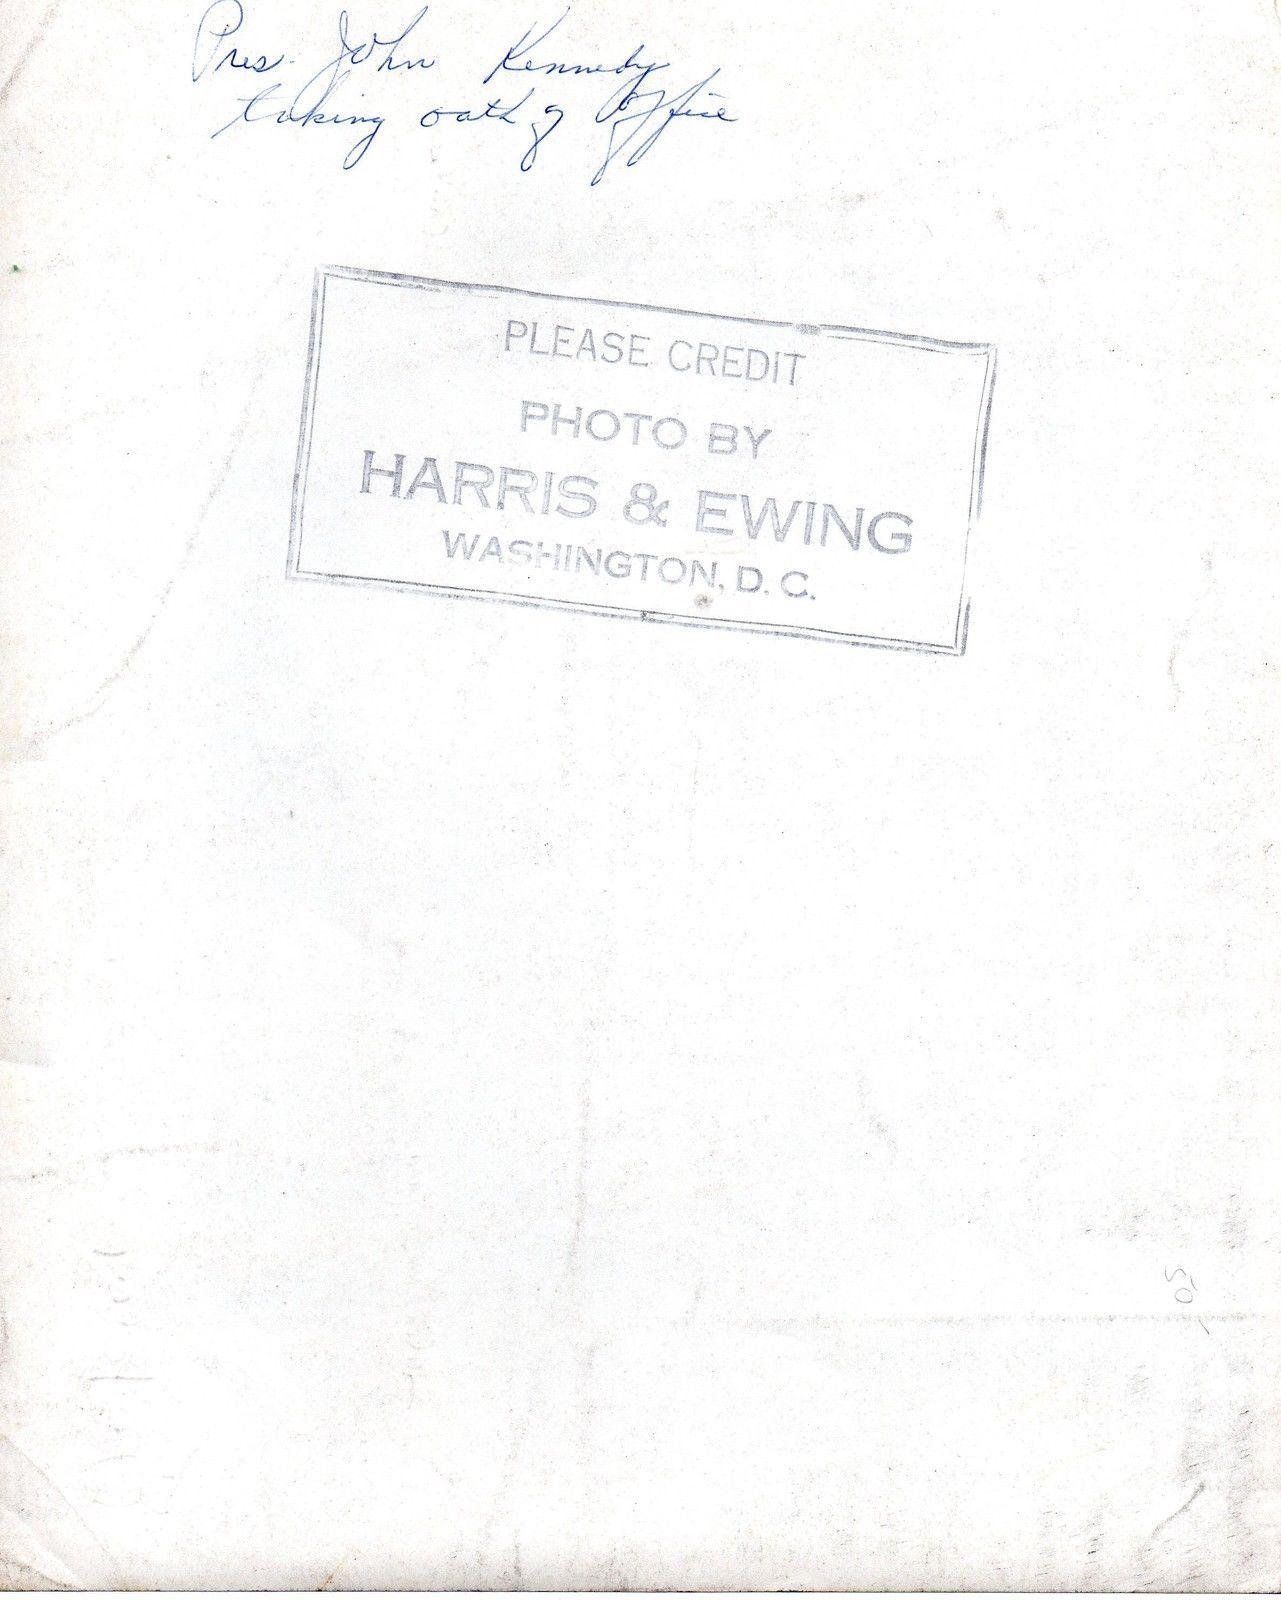 JOHN F. KENNEDY Inauguration Photo signed by Earl Warren, Wm. Douglas, Rusk +++